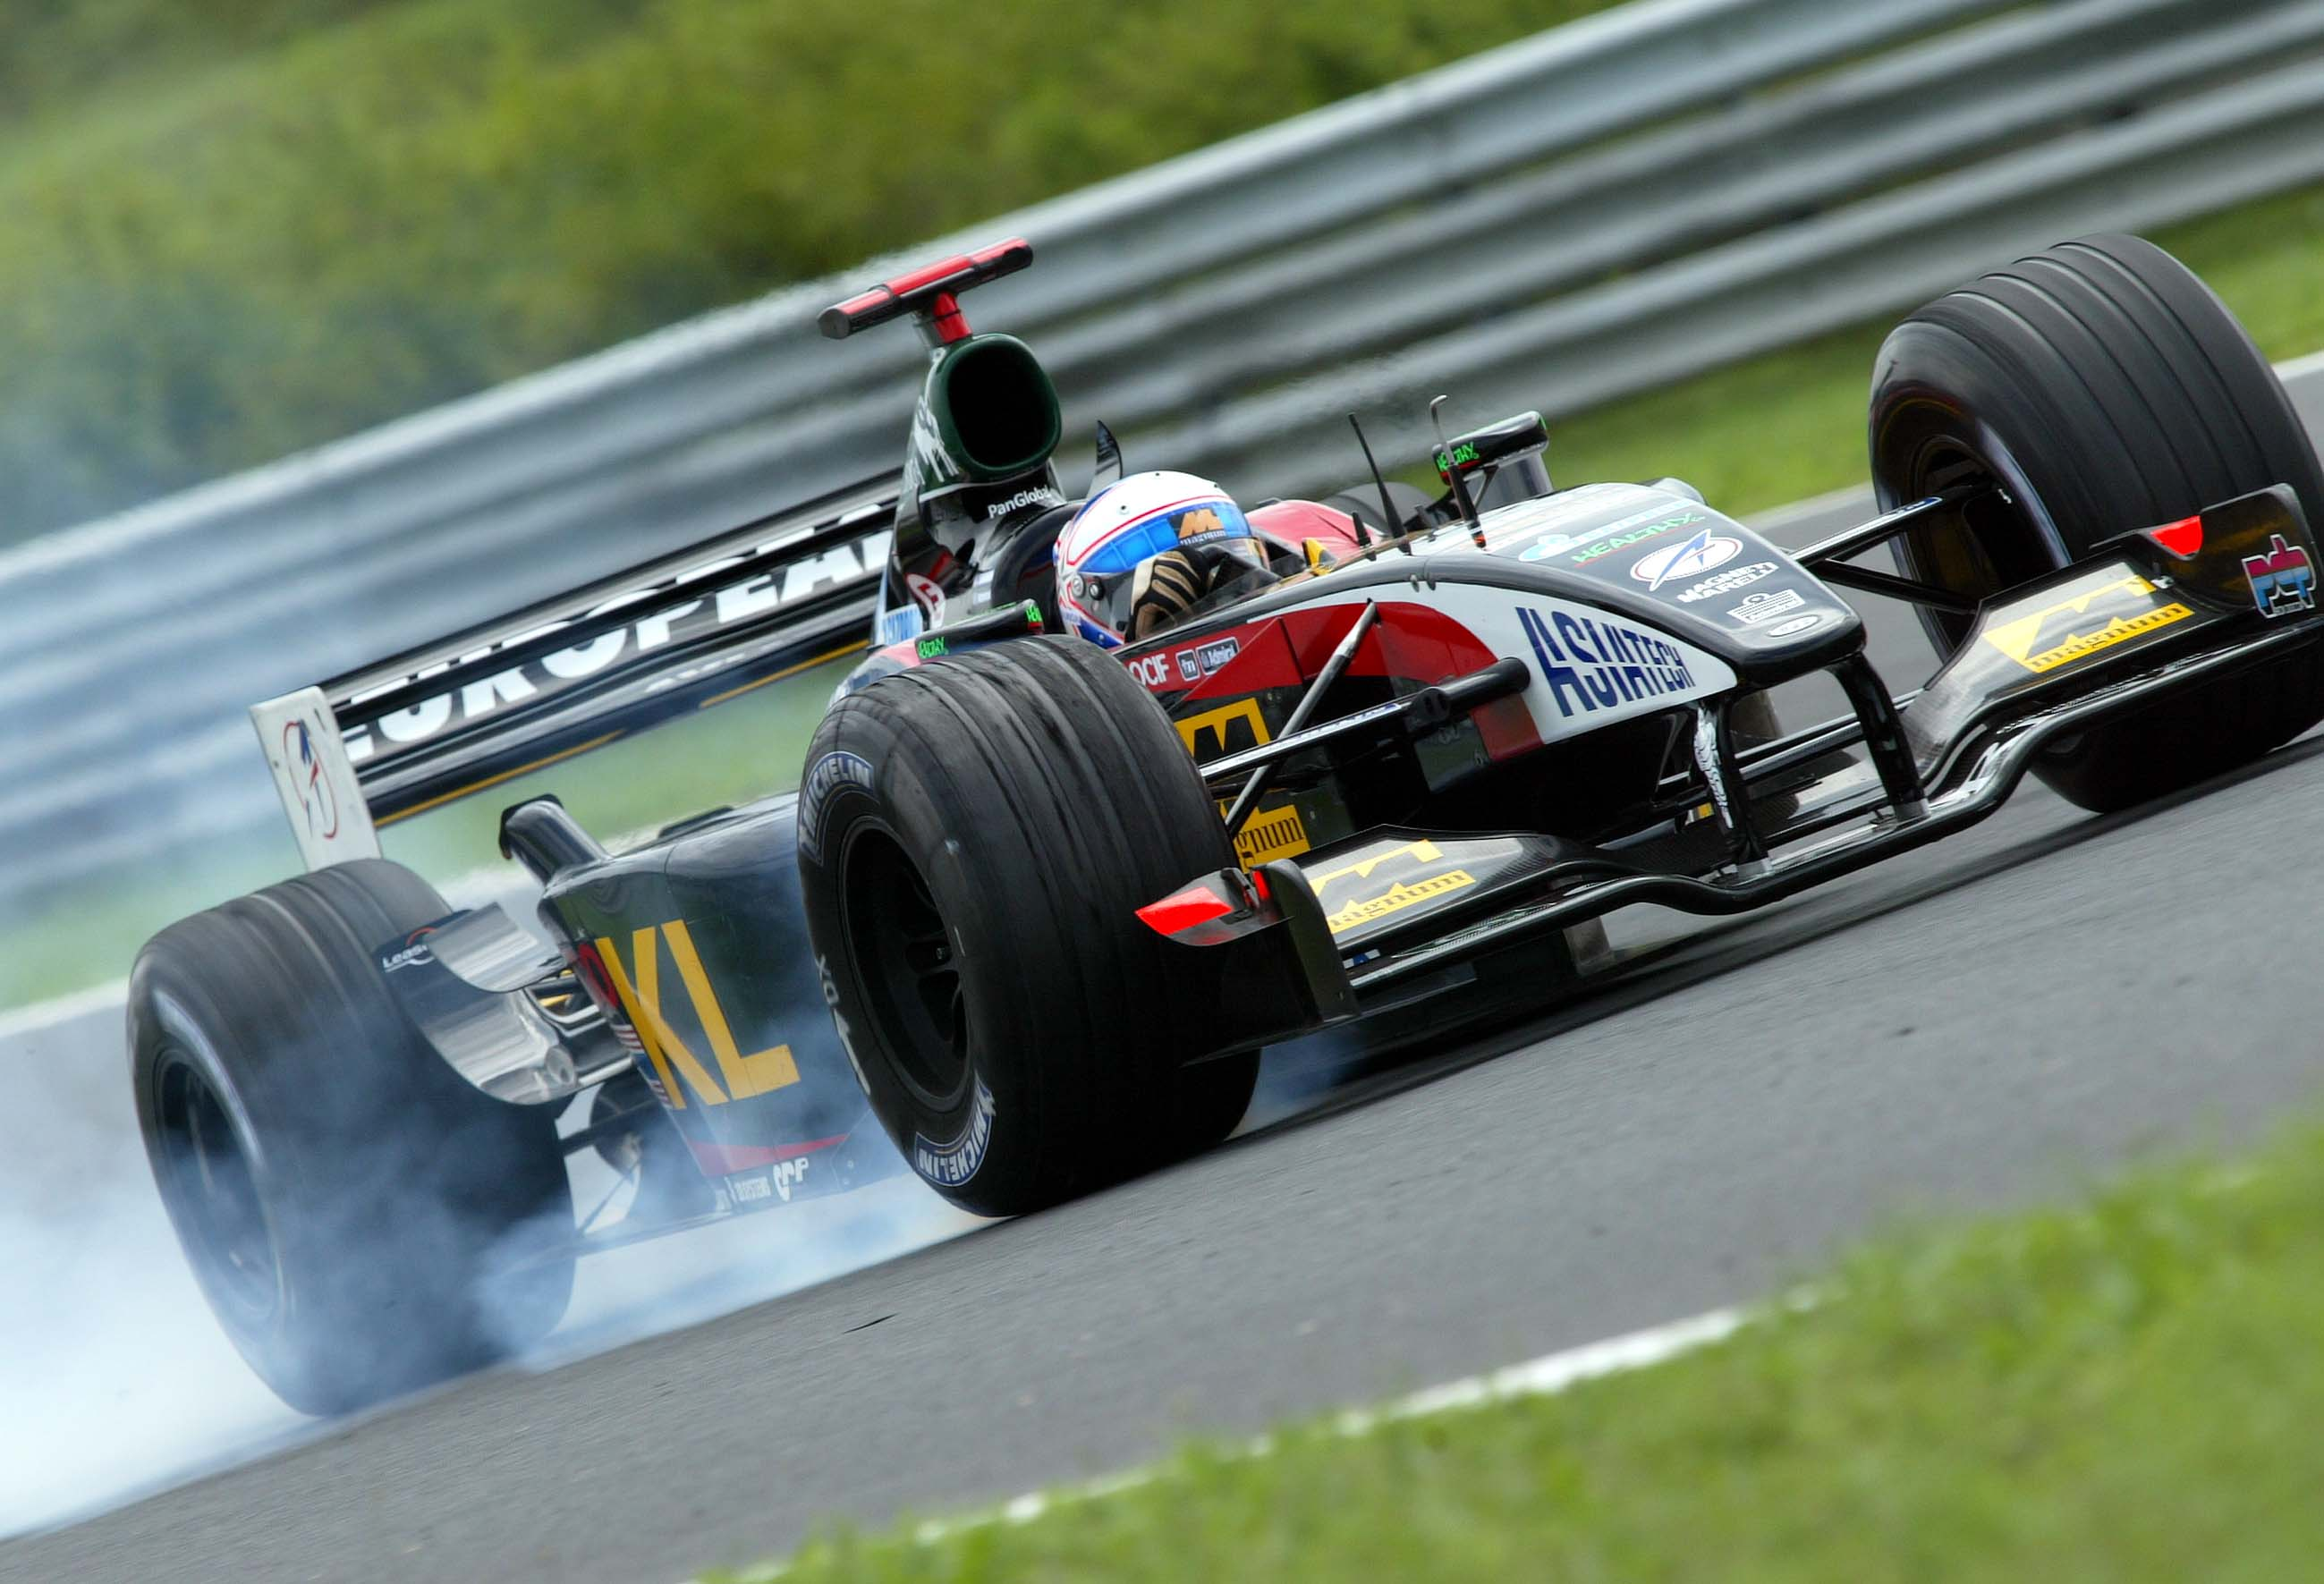 F1 In Budapest, Training Am Freitag, Anthony Davidson (minardi, Ps02) Auf Der Strecke...